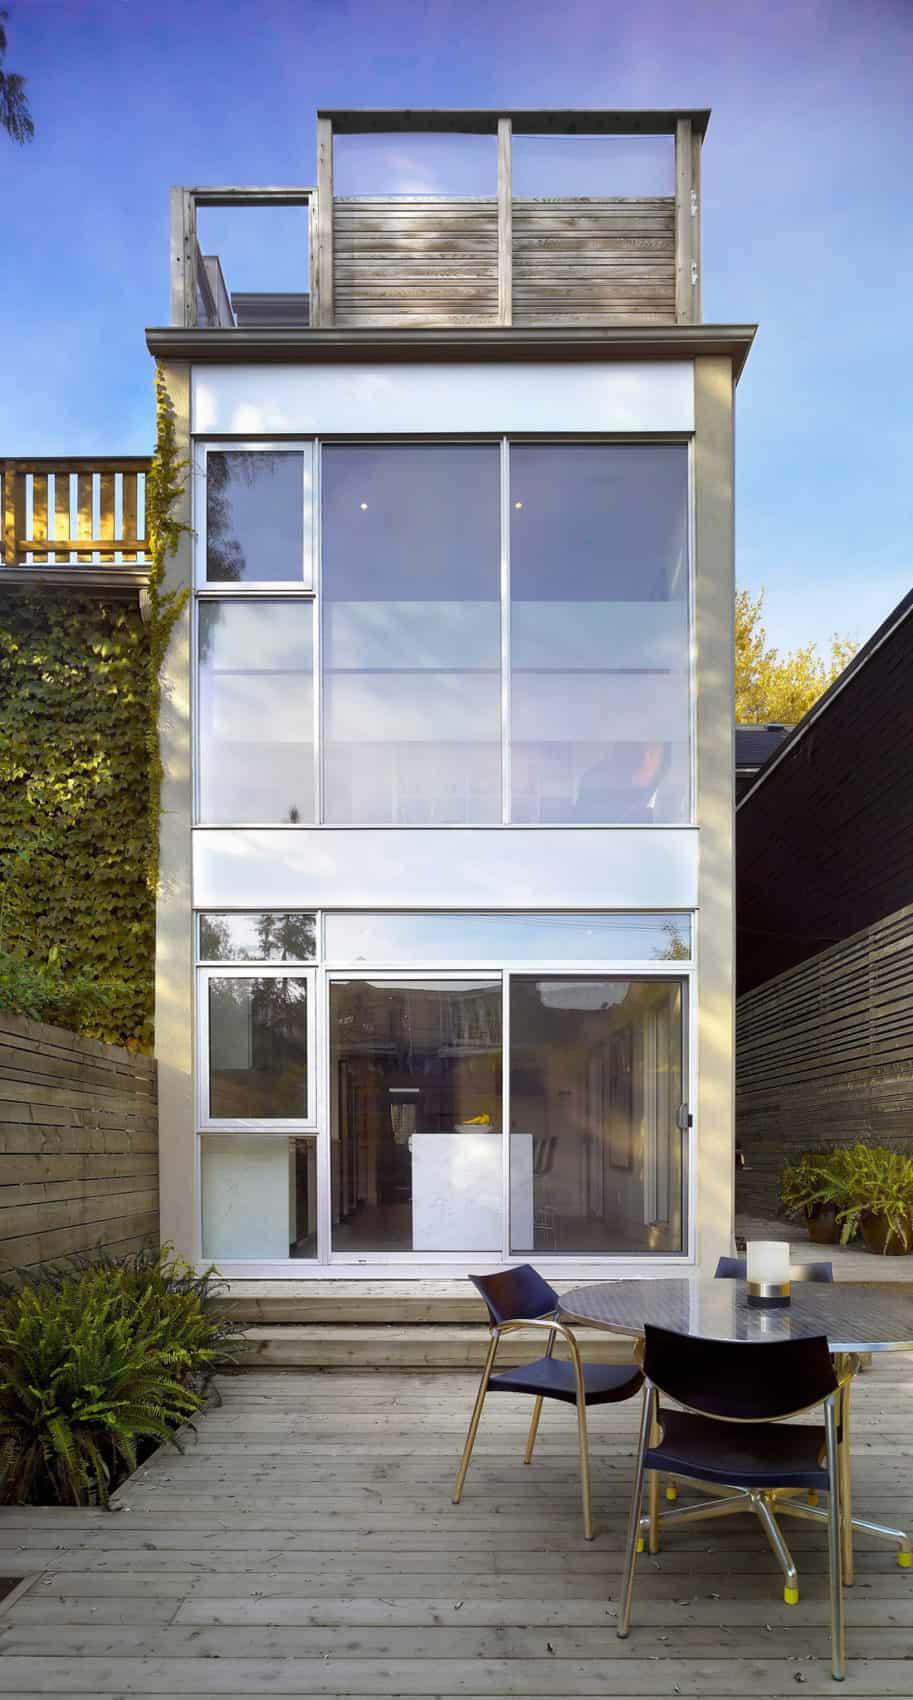 Cabbagetown Residence by DUBBELDAM Architecture + Design (2)